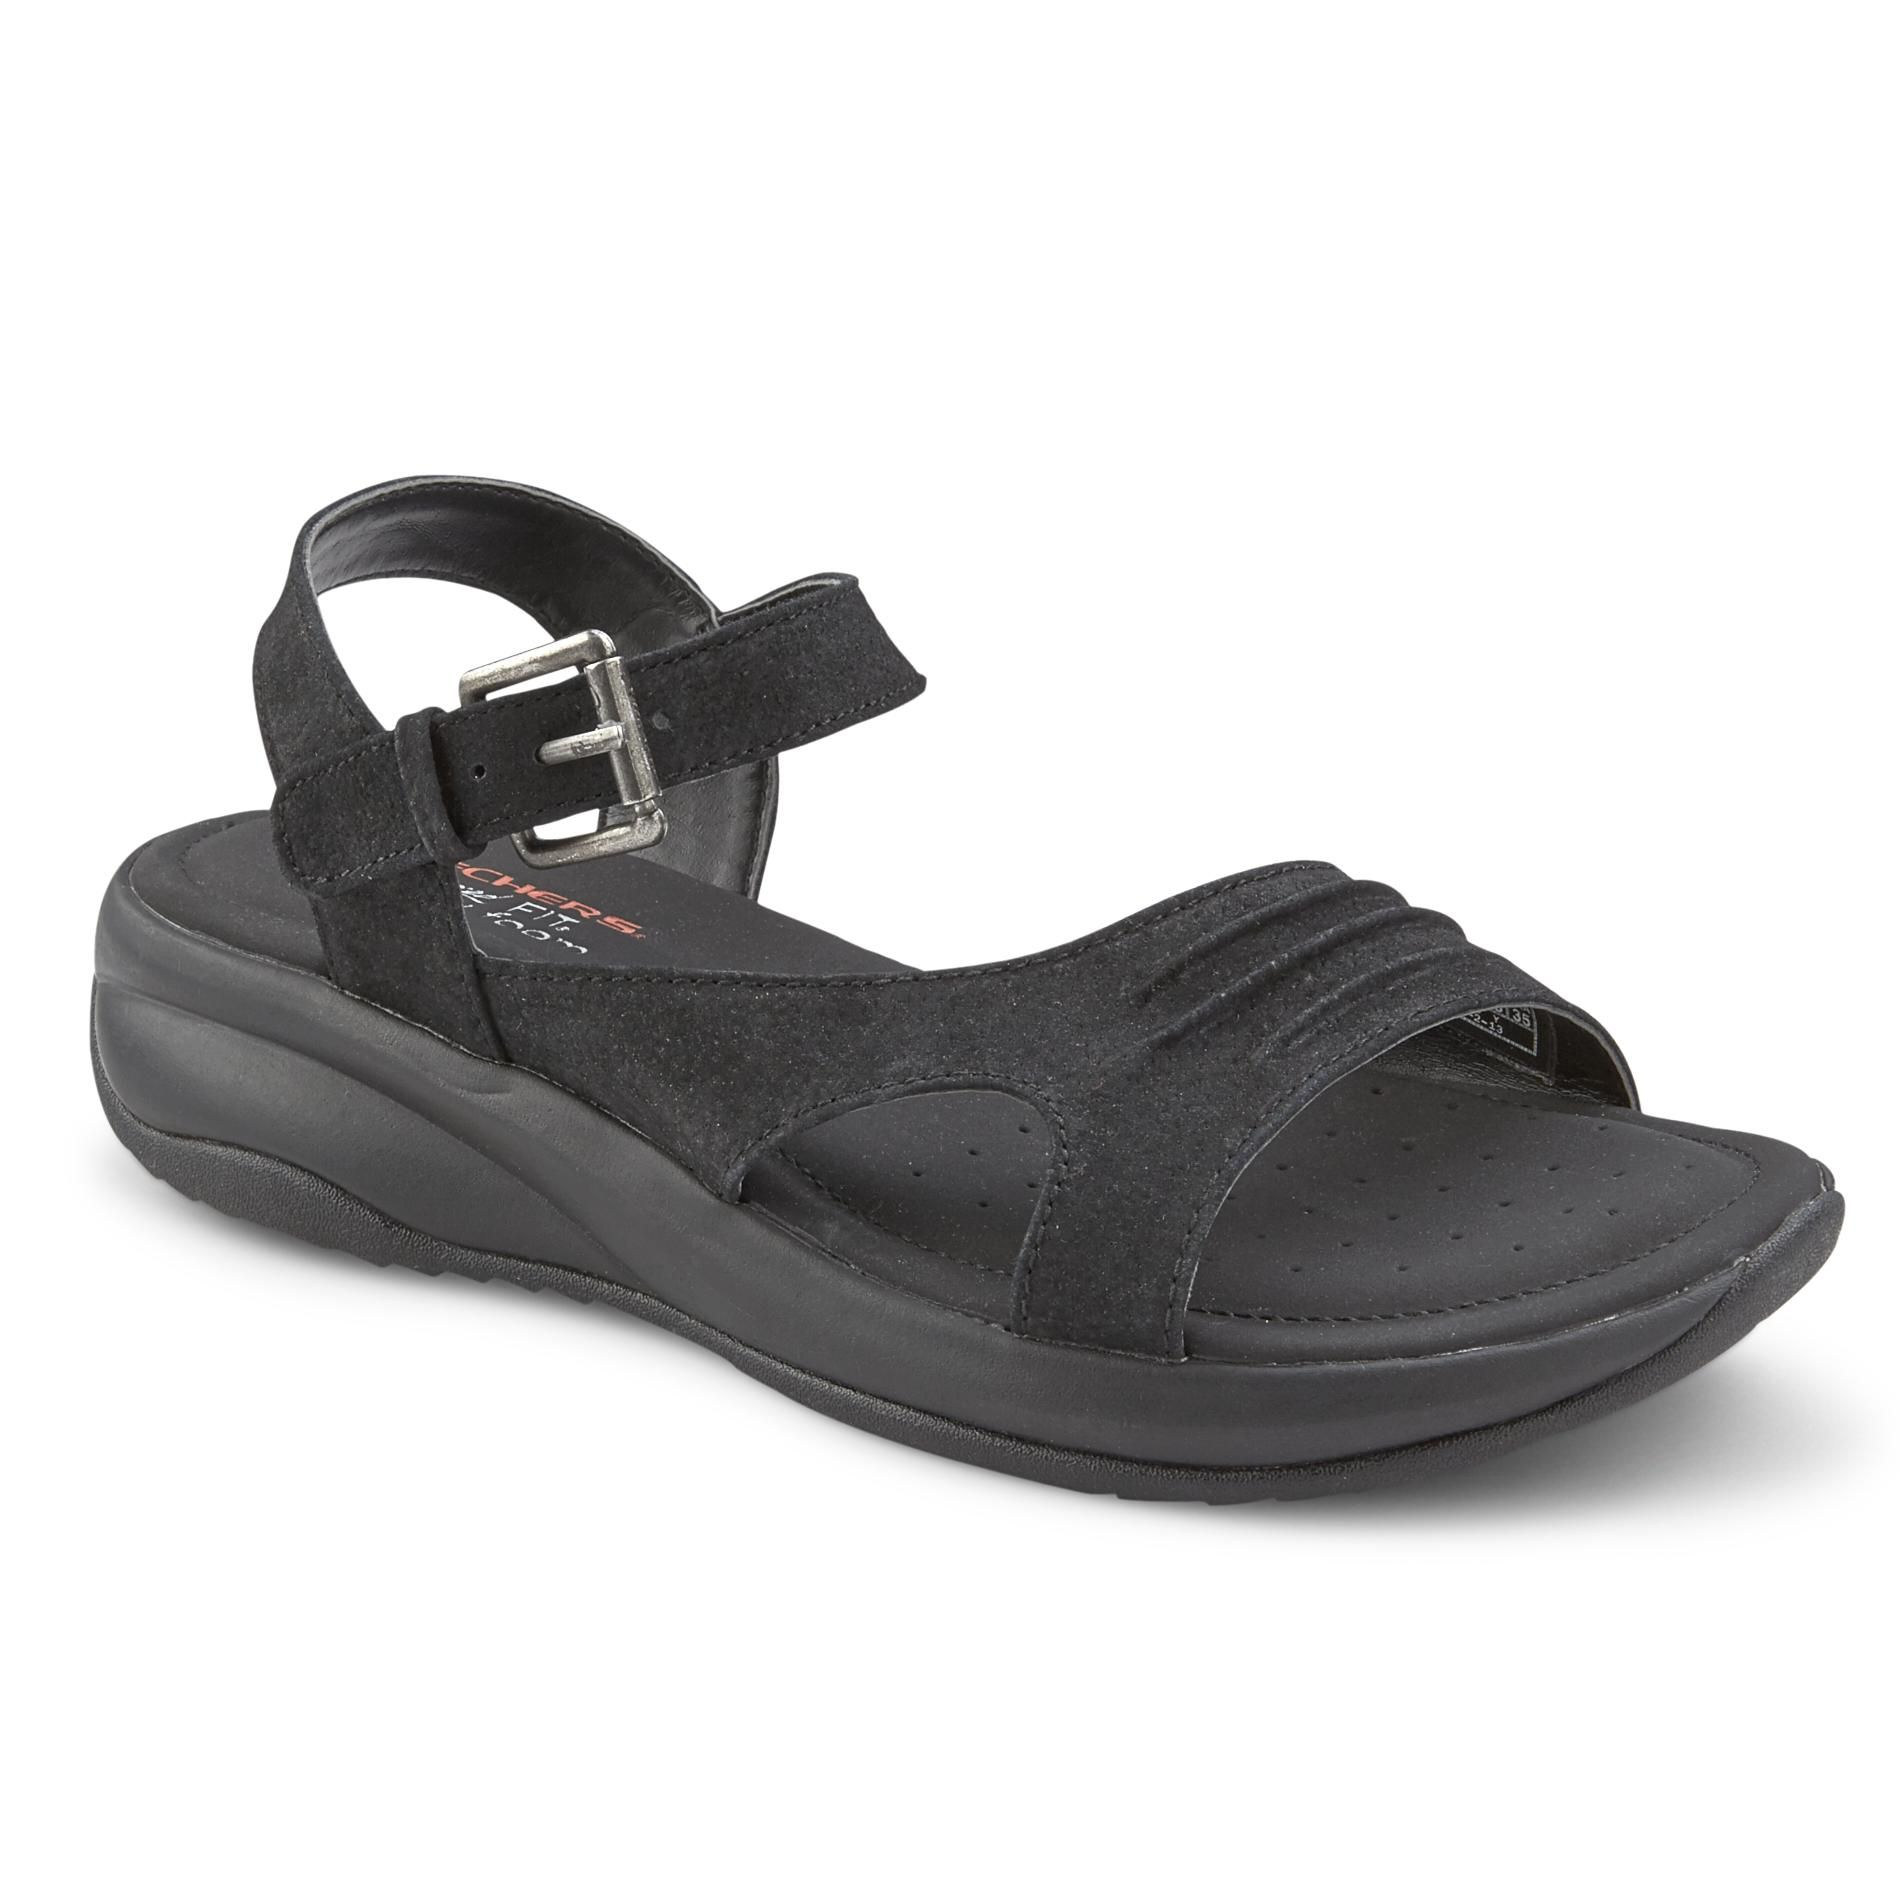 Skechers Afterburn Memory Foam Walking Shoes For Men